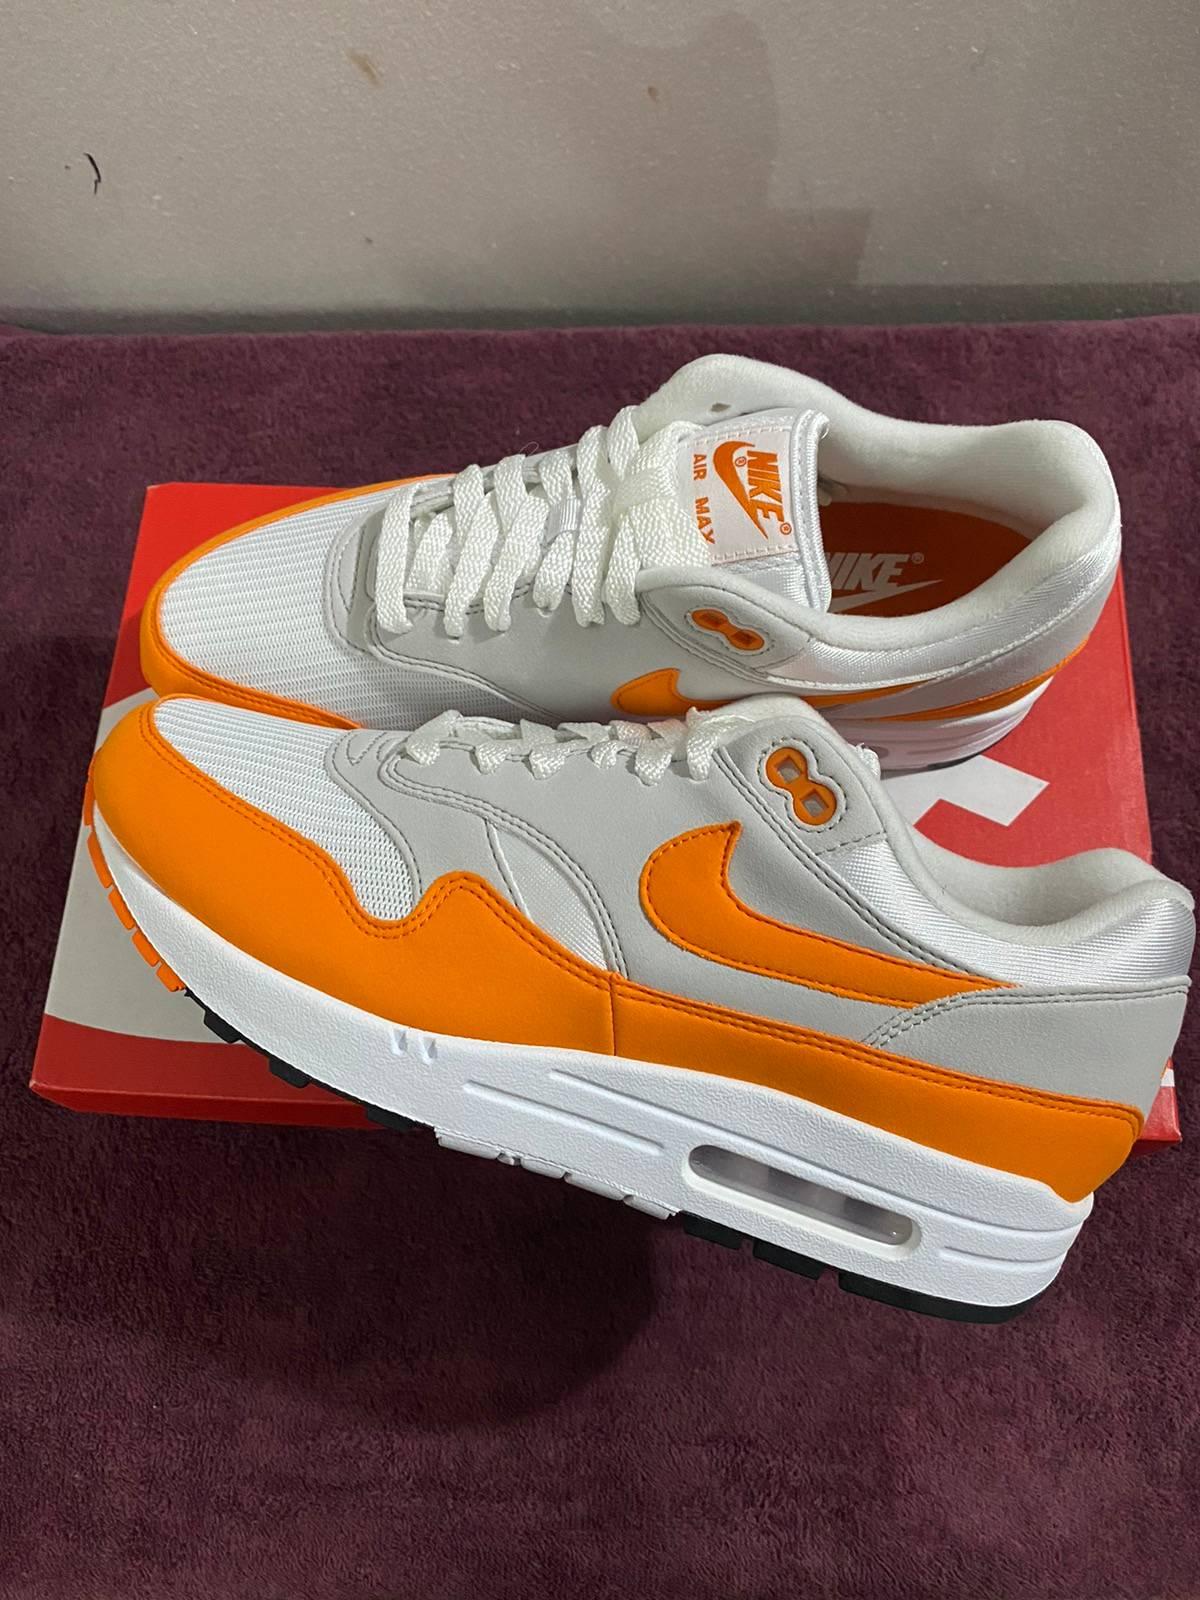 "Nike Nike Air Max 1 ""Anniversary Orange"" - Size 10"